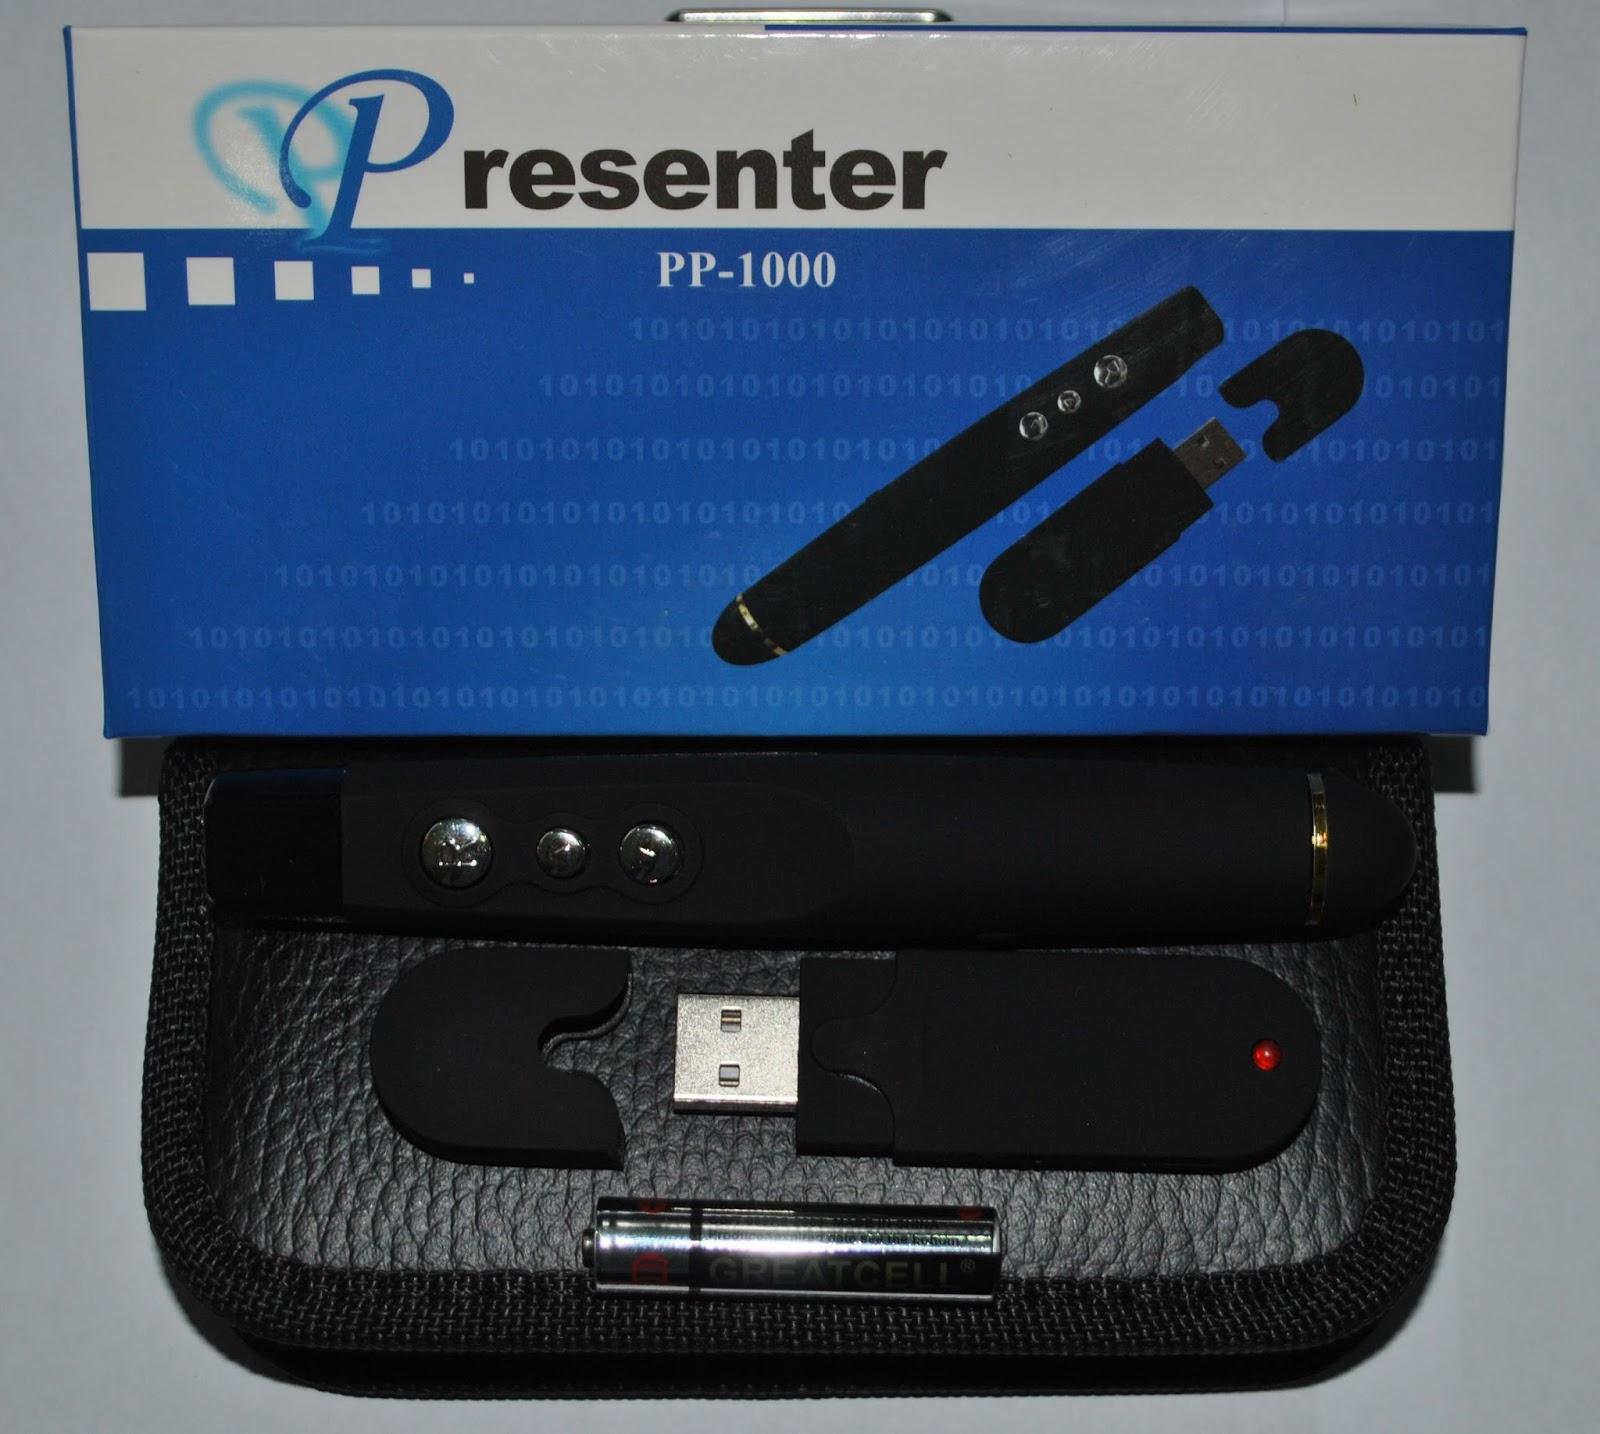 Aksesoris Comp 2012 Laser Pointer Pp1000 Presenter Pp 1000 A 810